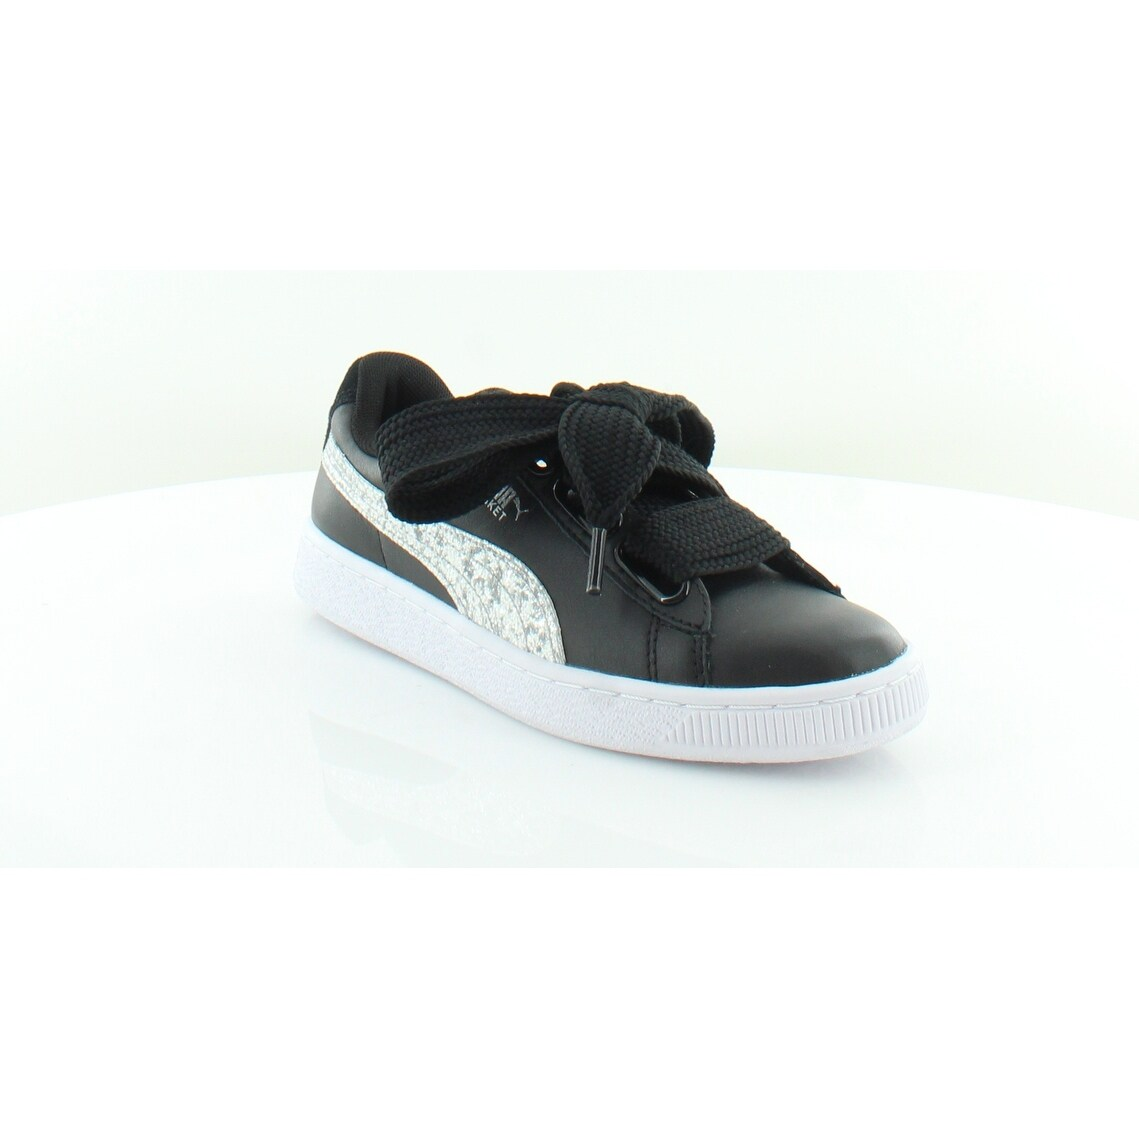 Shop Puma Puma Fierce Evoknit Metallic Sneaker, BlackSilver